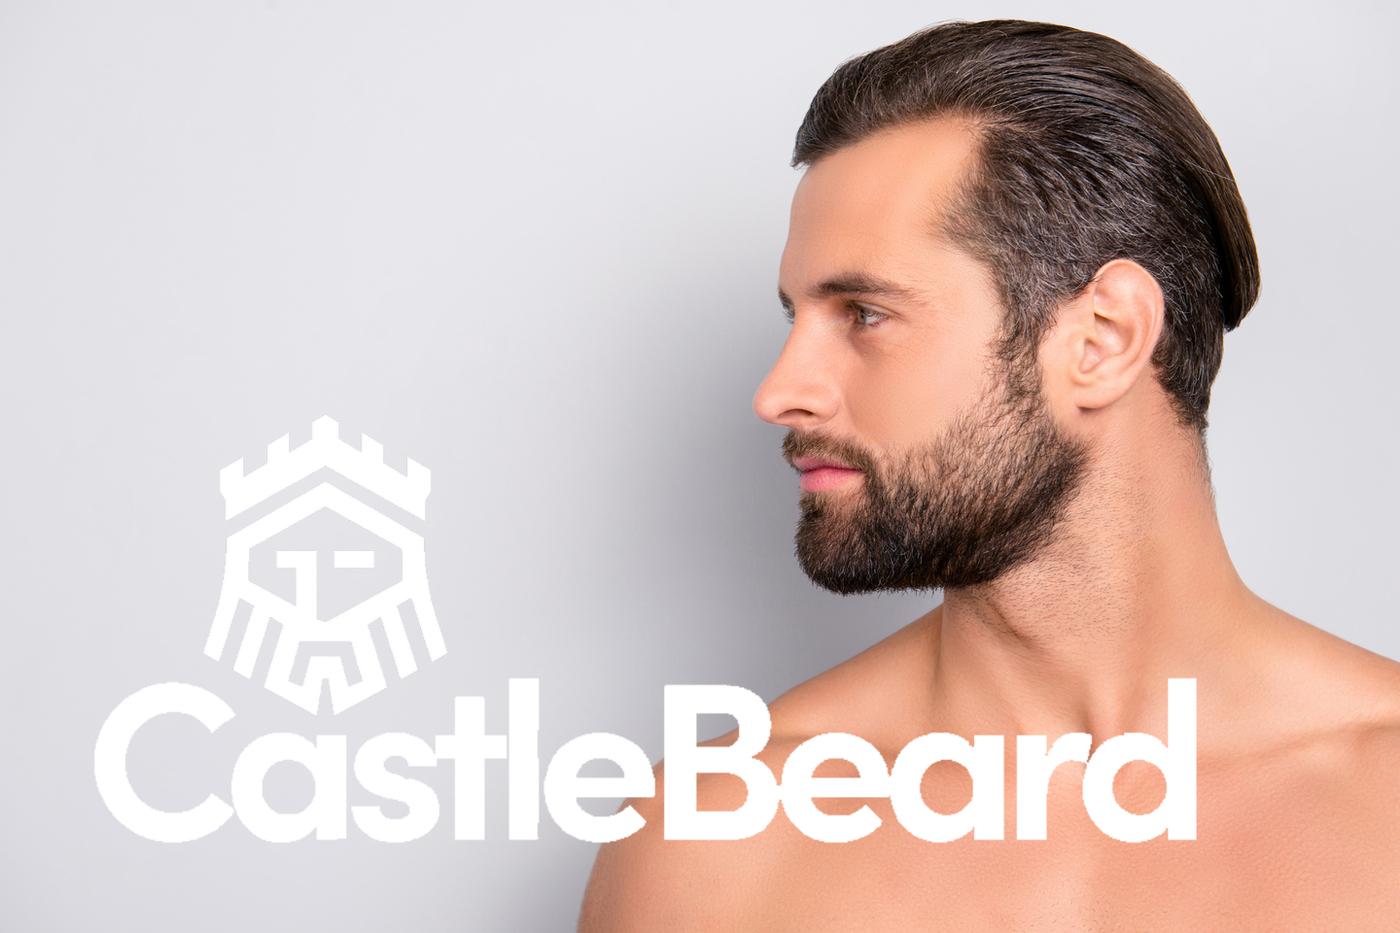 Castlebeard